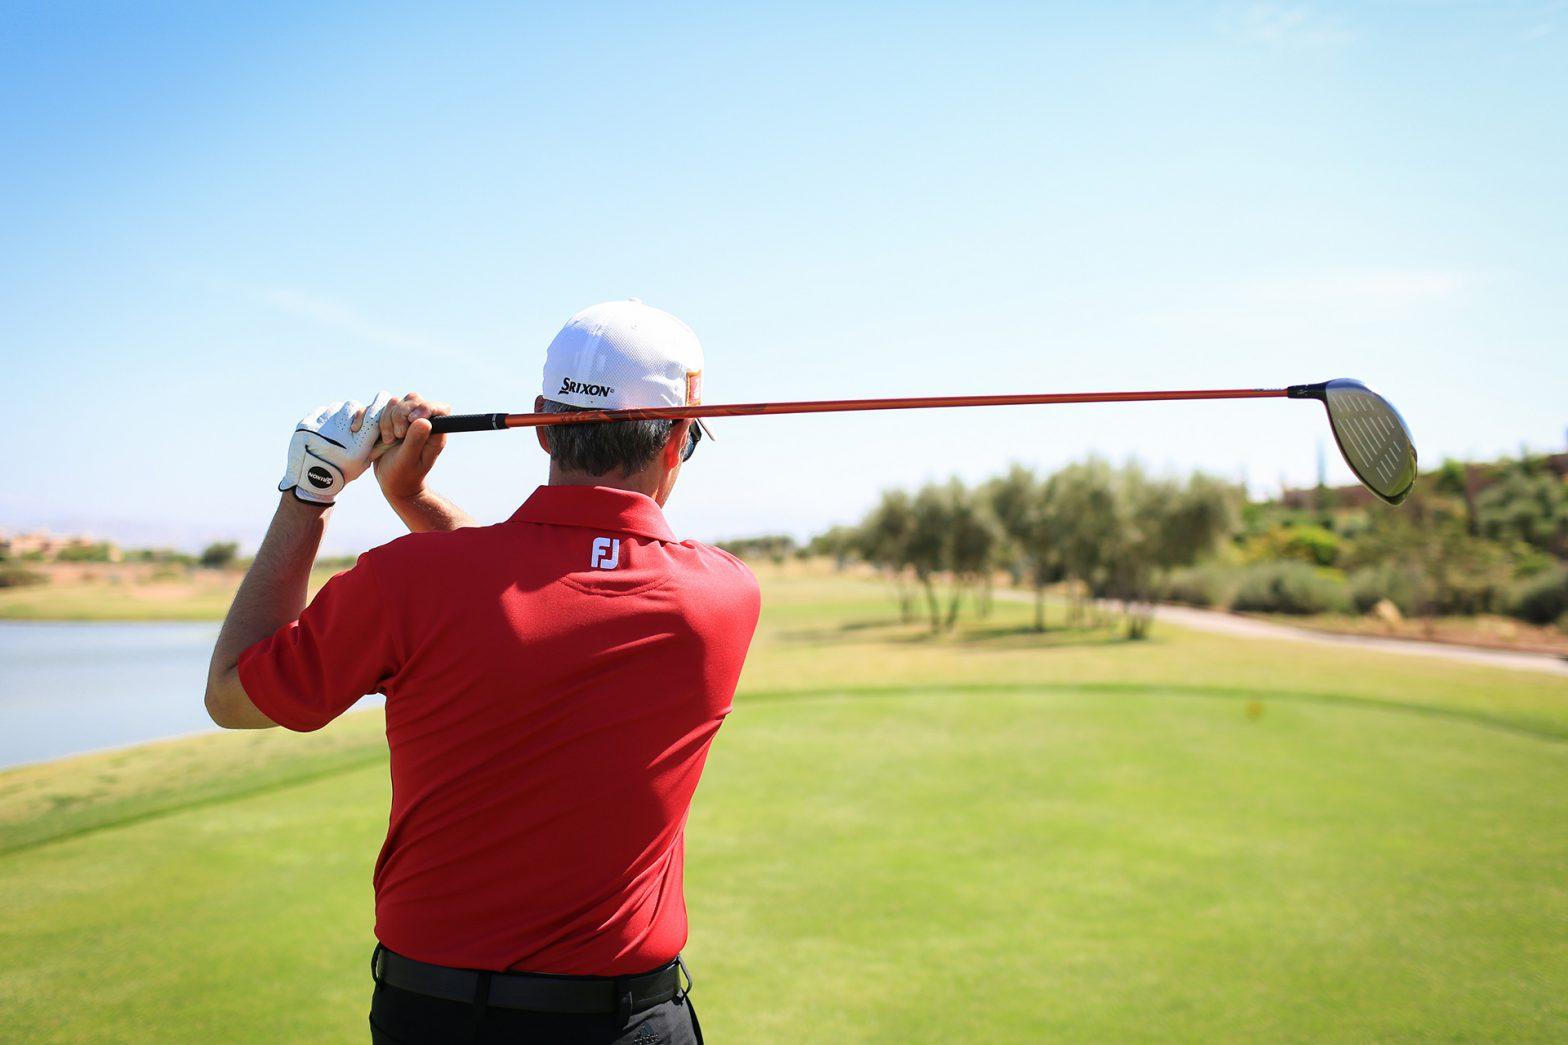 Le Mode Jeu | Enphase Golf